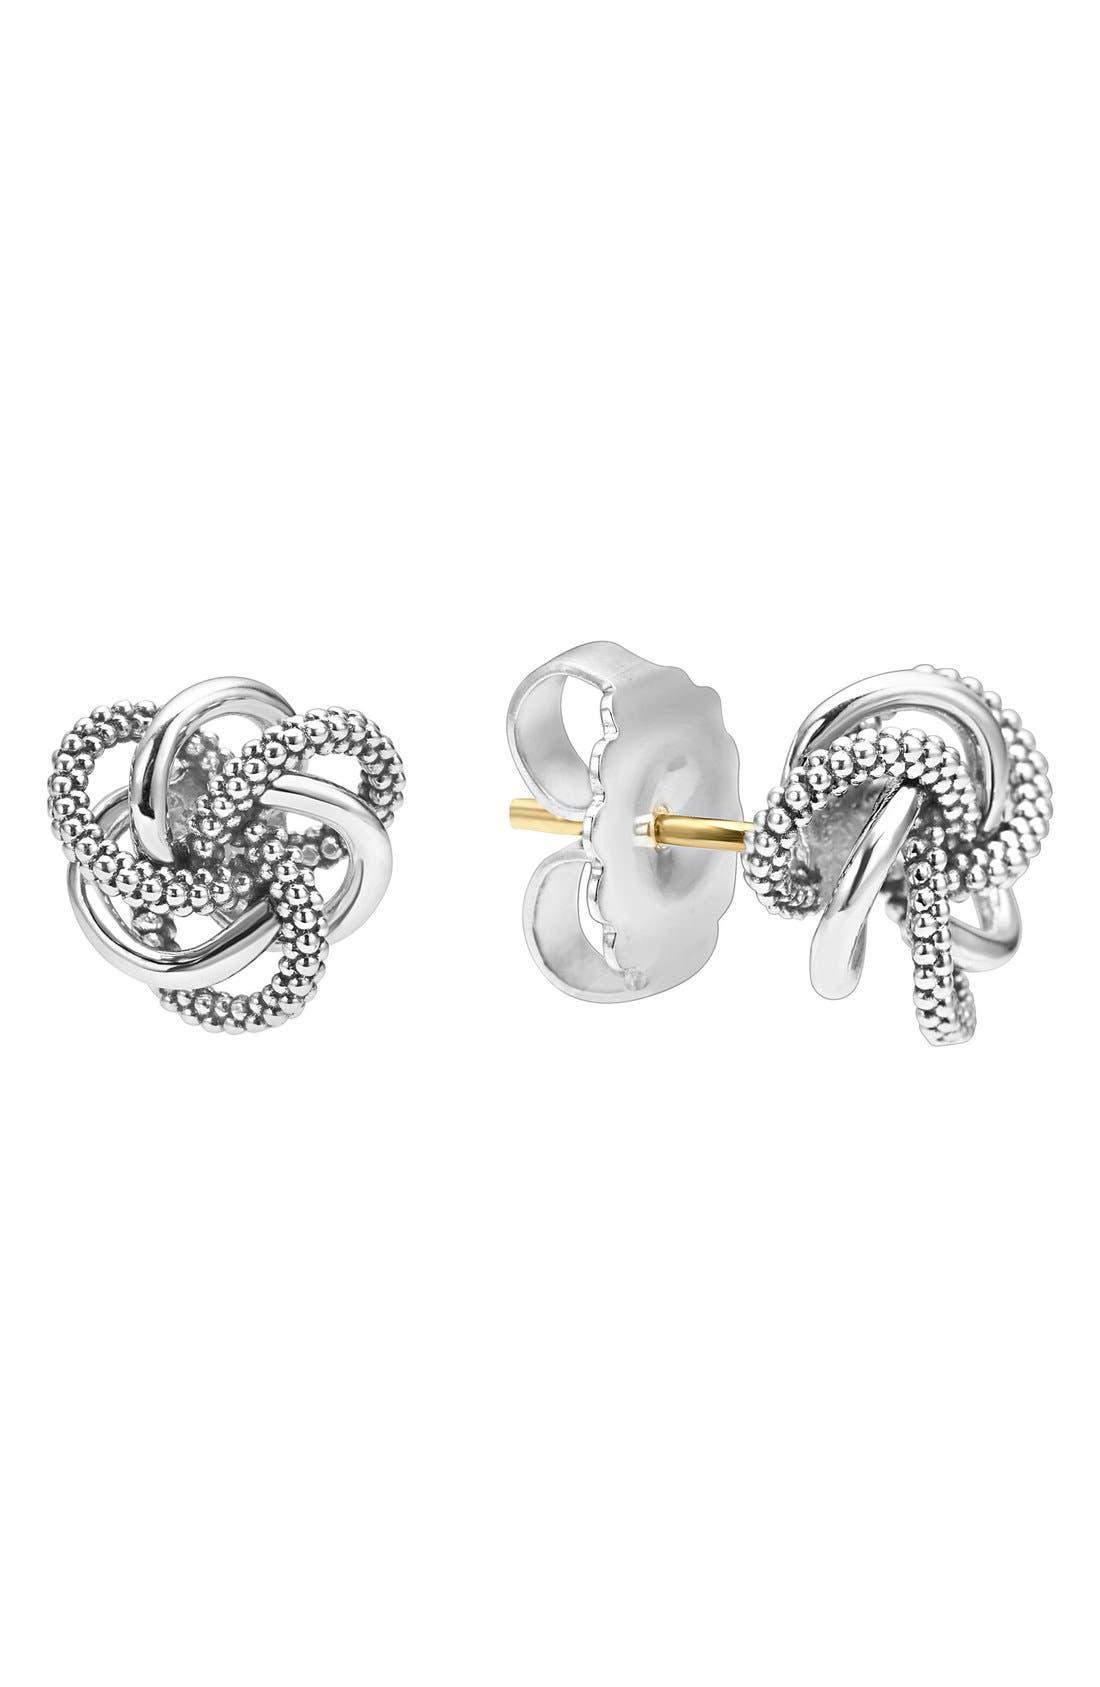 LAGOS 'Love Knot' Sterling Silver Stud Earrings